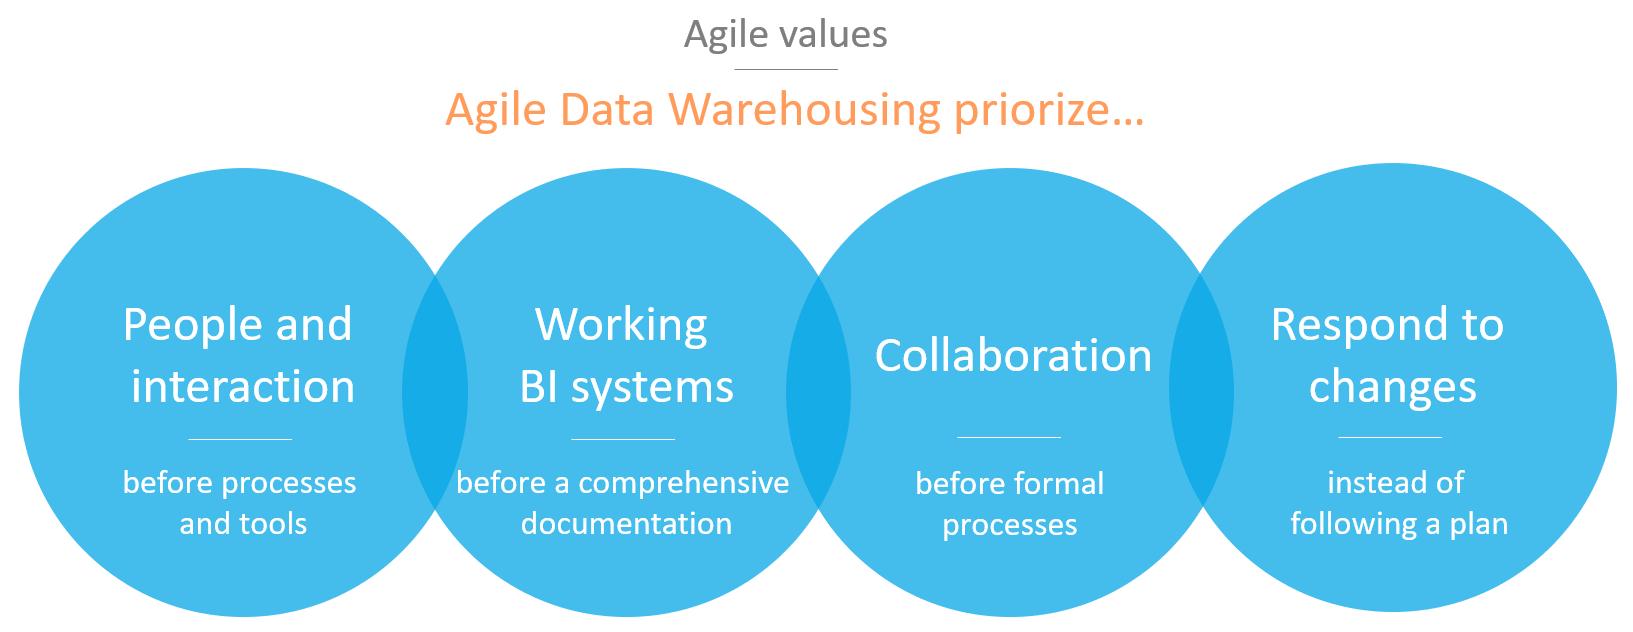 agile-values.png